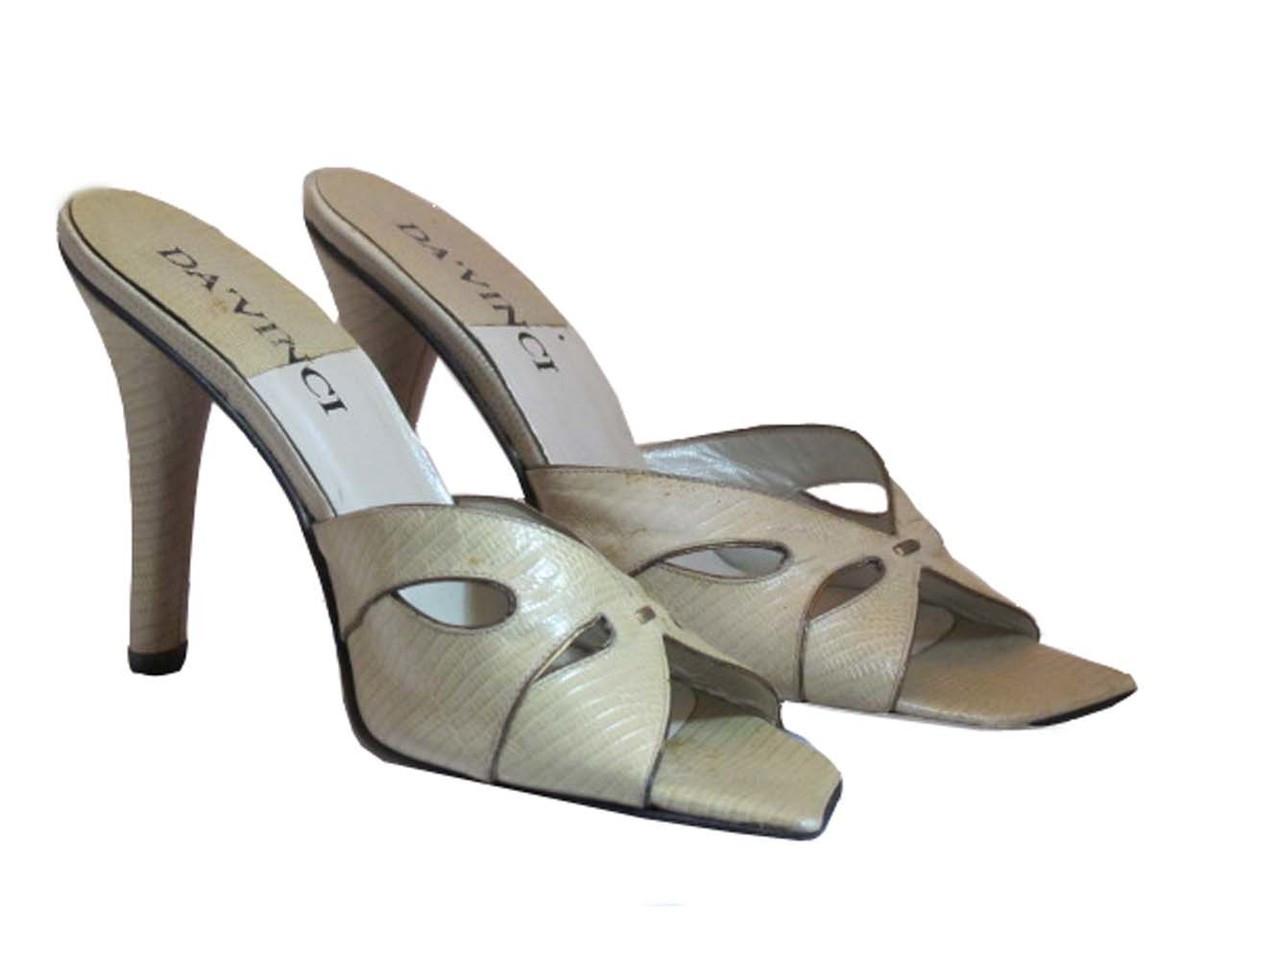 589db0a2bb0b7 Davinci Italian Women's High Heel Sandal NE38